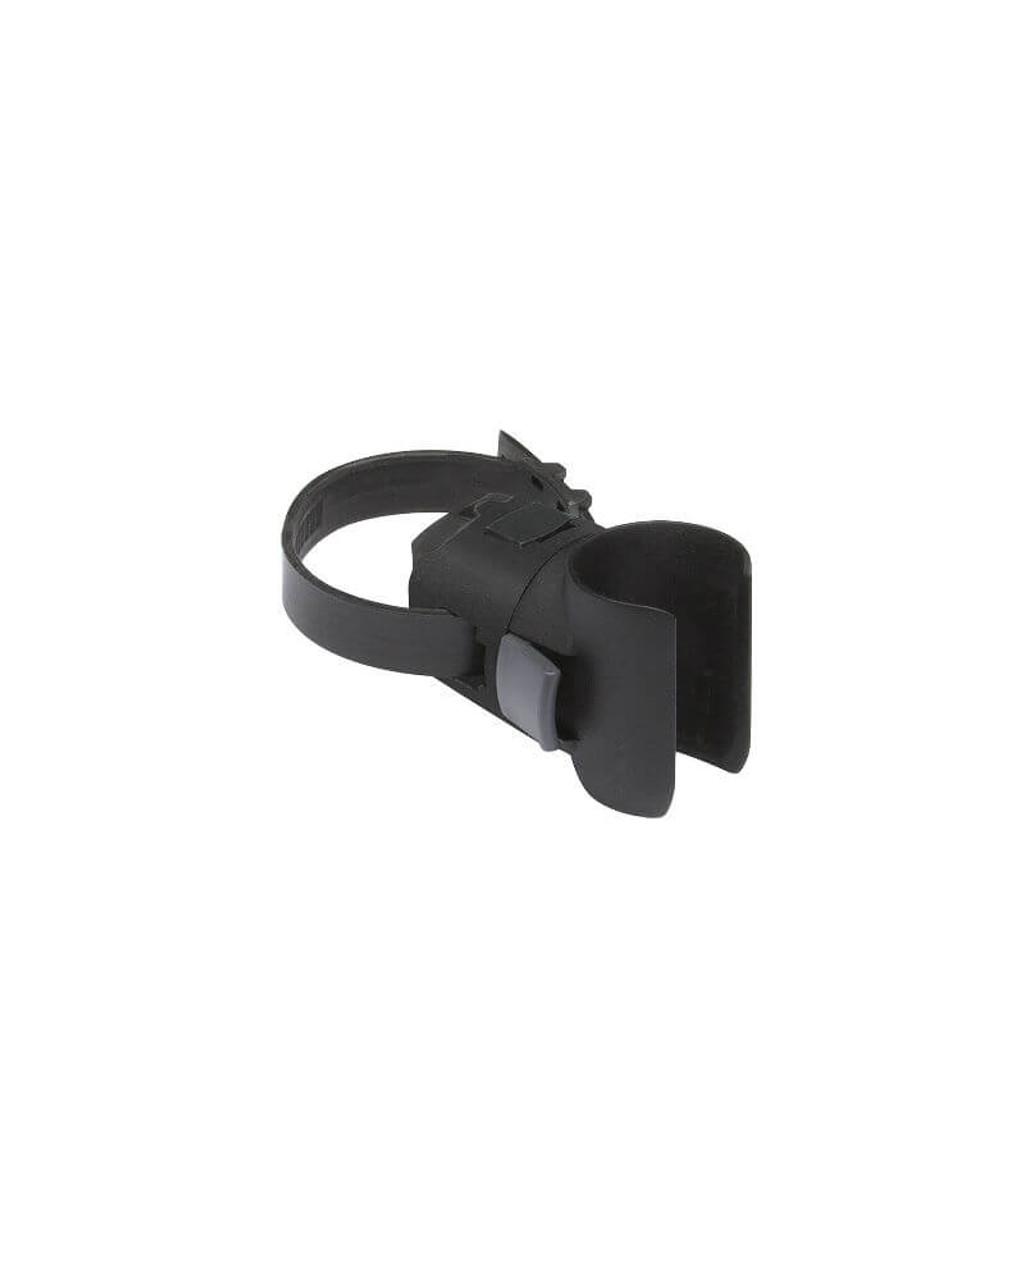 ABUS Coil Cable Lock Numero 5510C 70 in Black